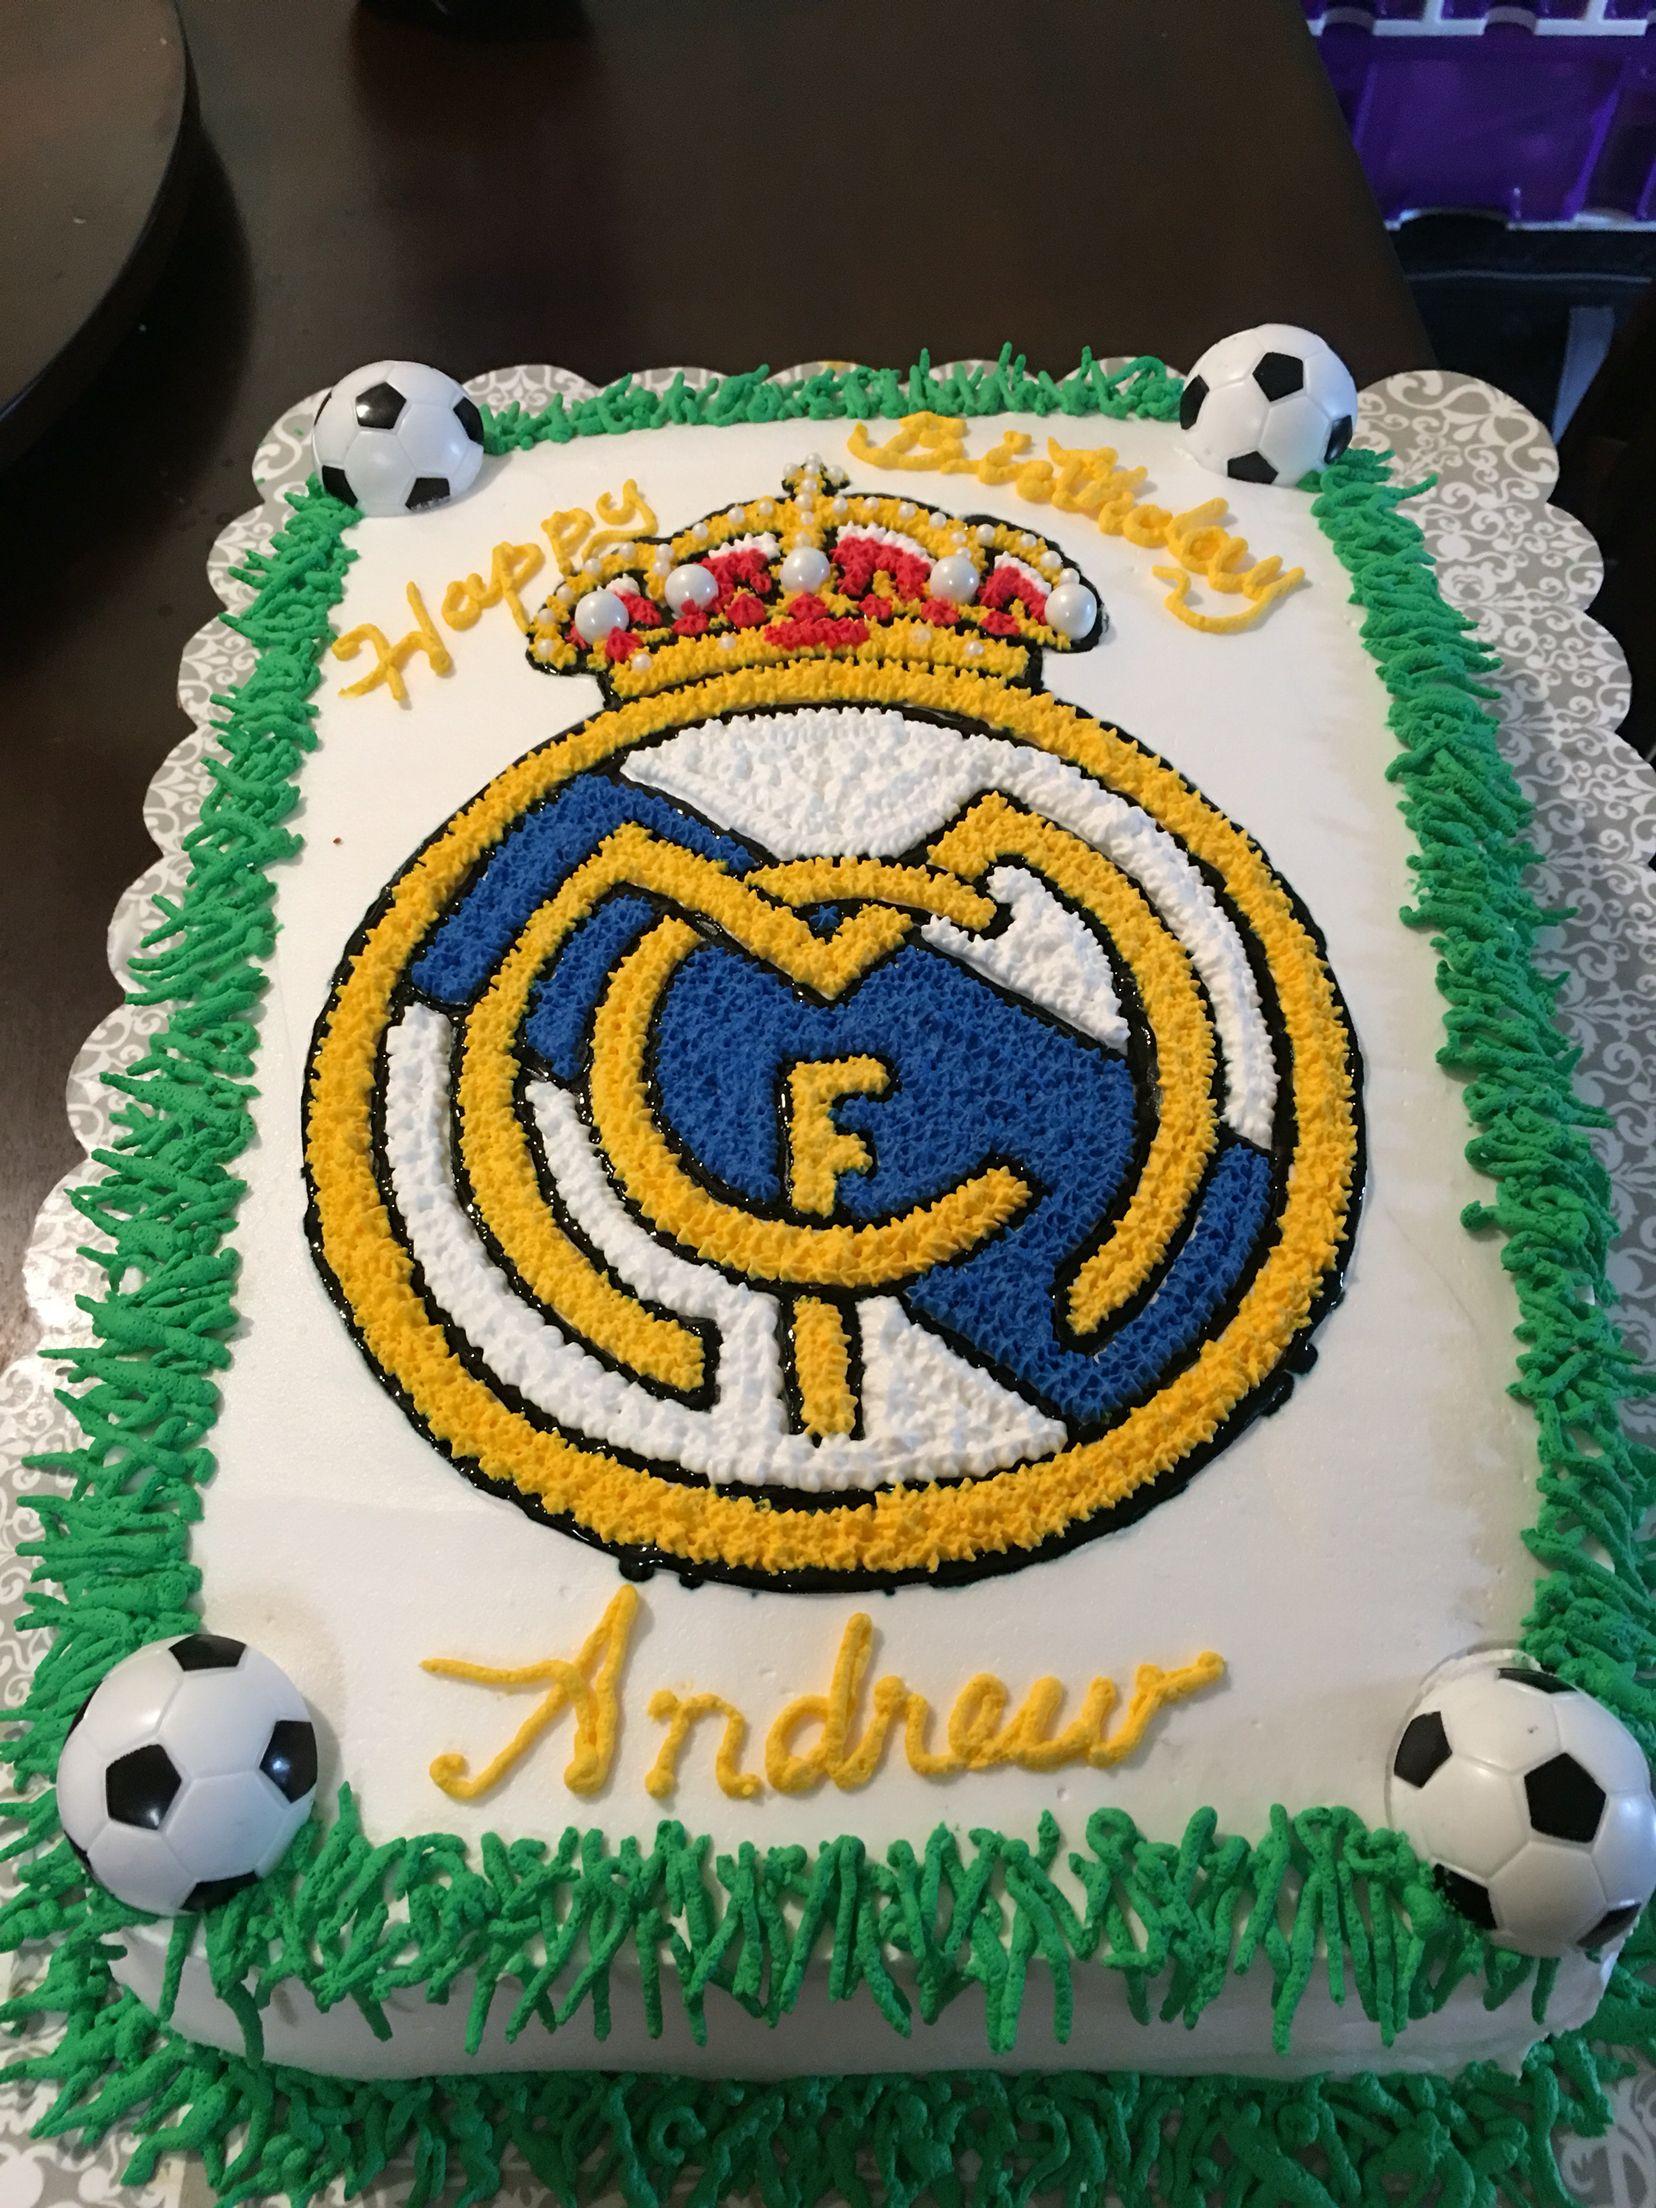 Real Madrid Cake Sweet Princess Cakes Pinterest Real Madrid - Real birthday cake images